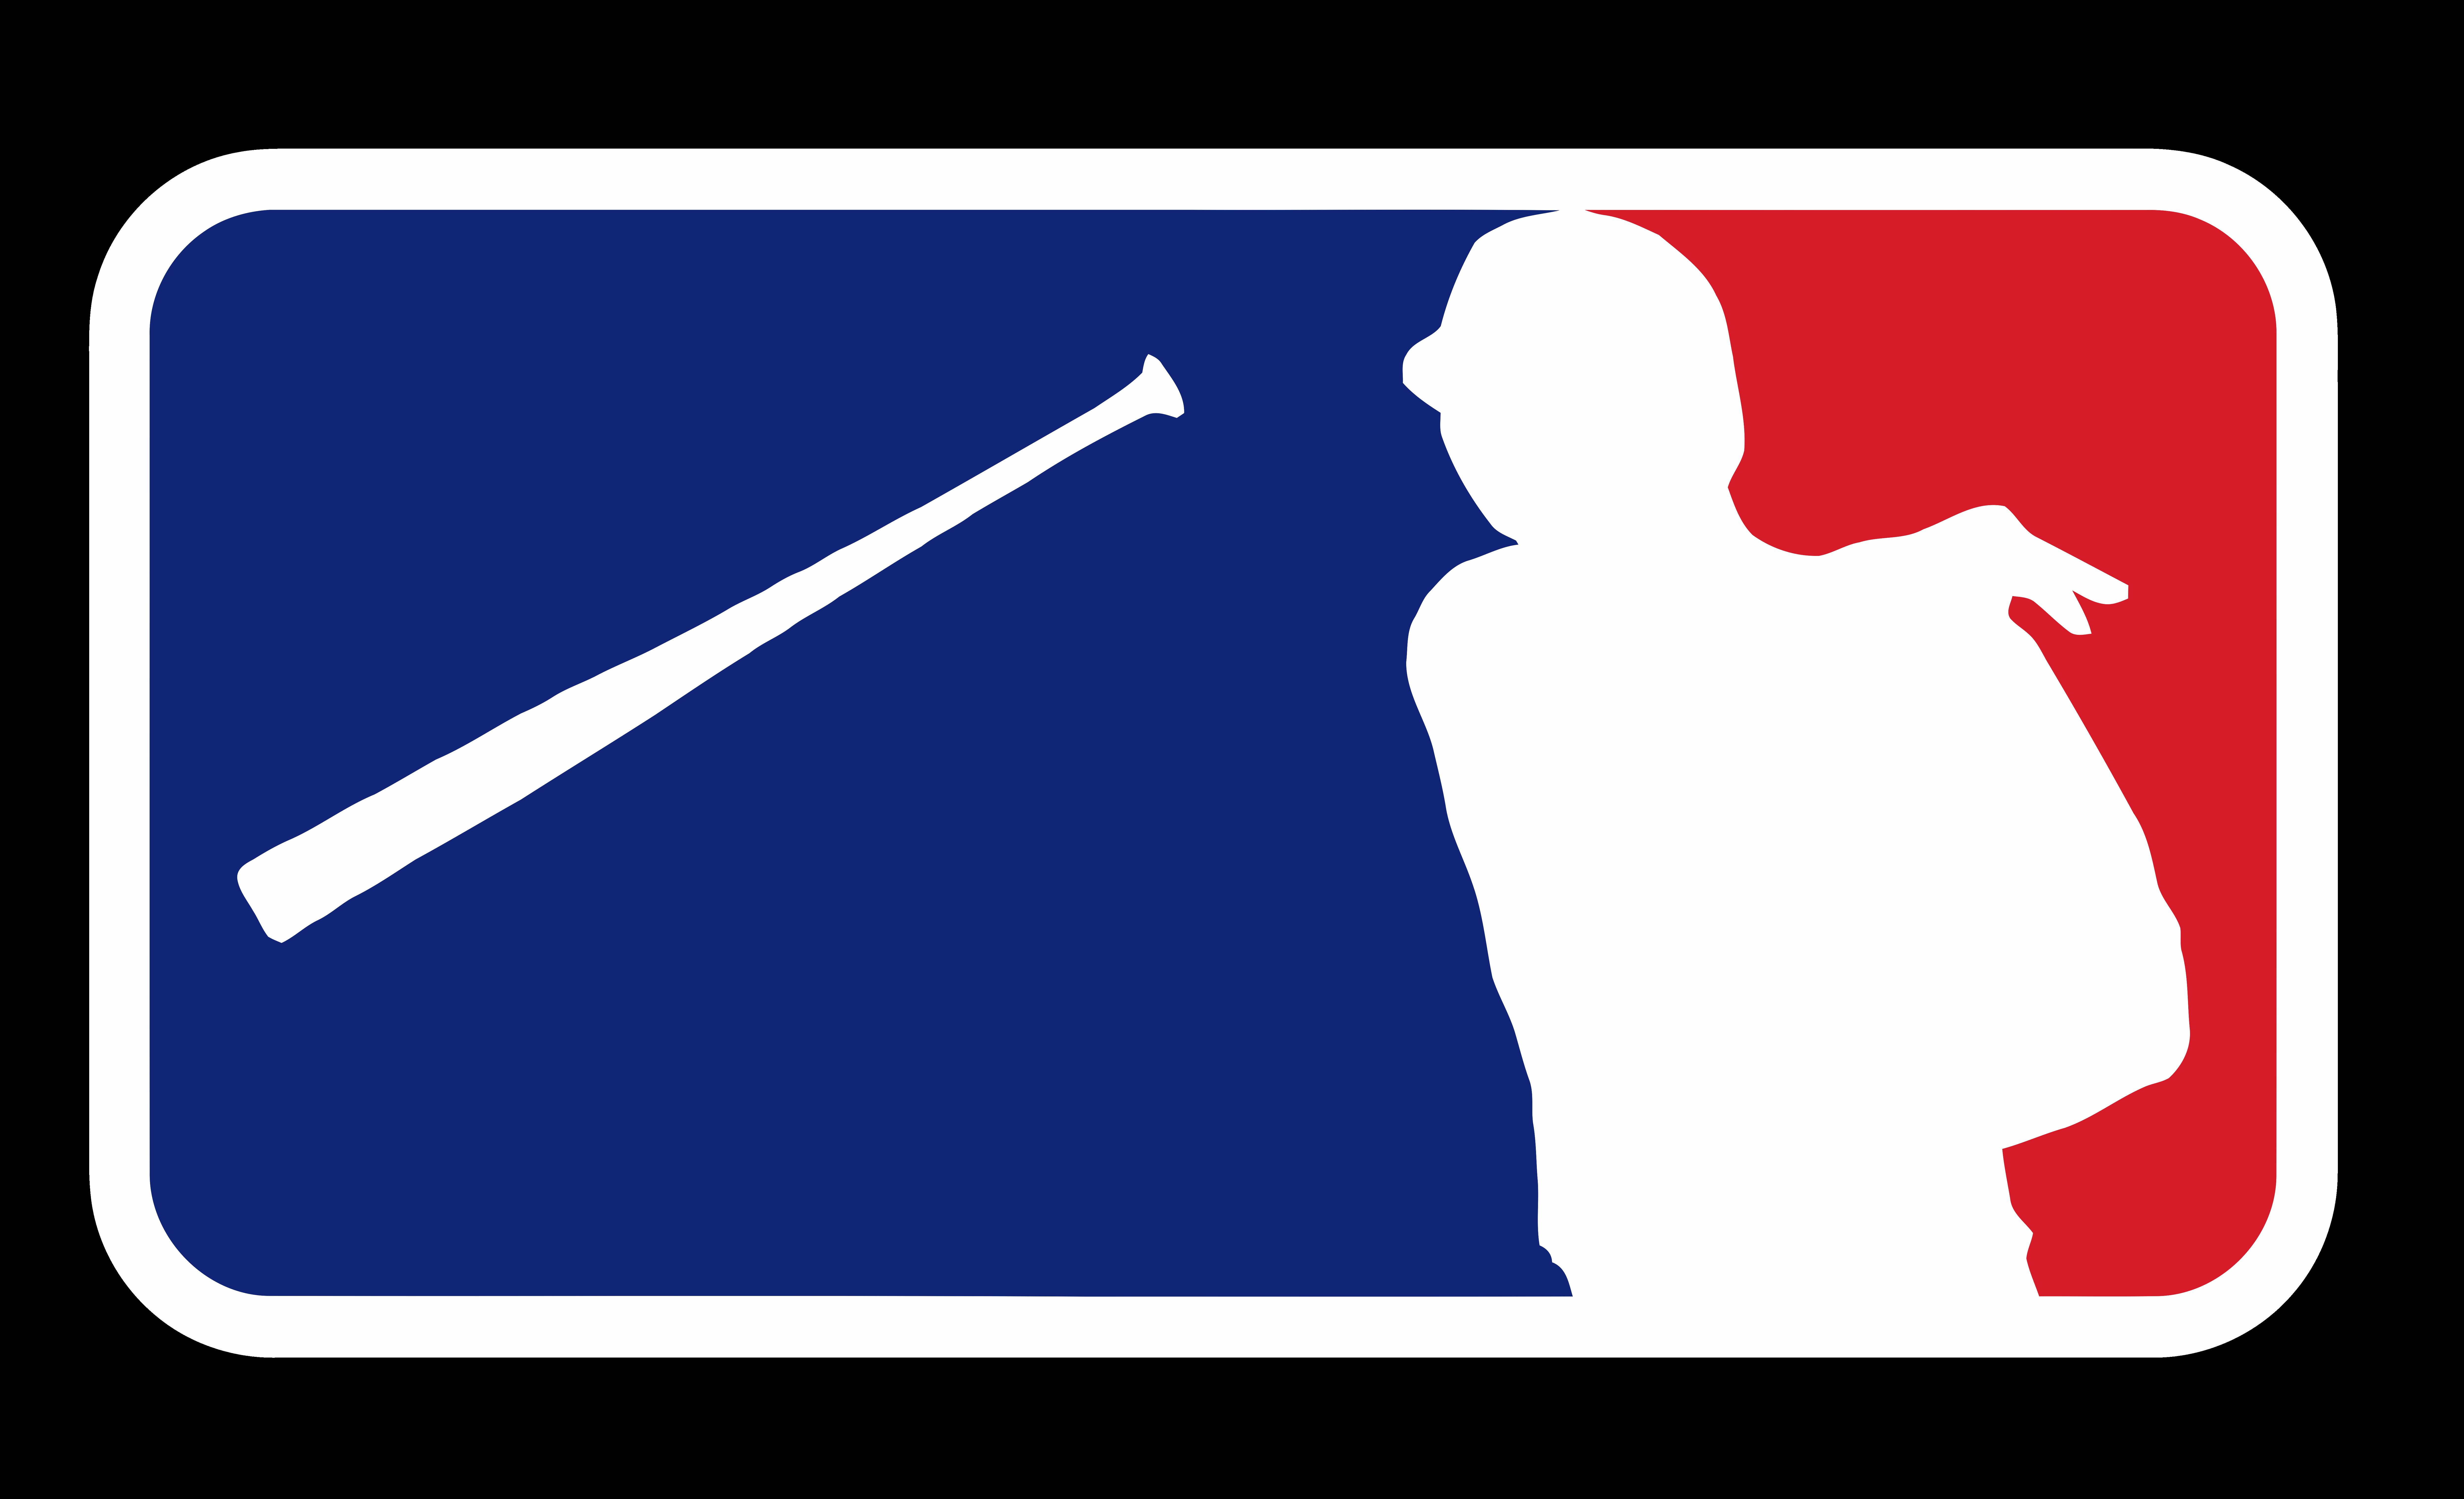 Clipart major league baseball bat svg download Bautista bat flip MLB logo : Torontobluejays svg download